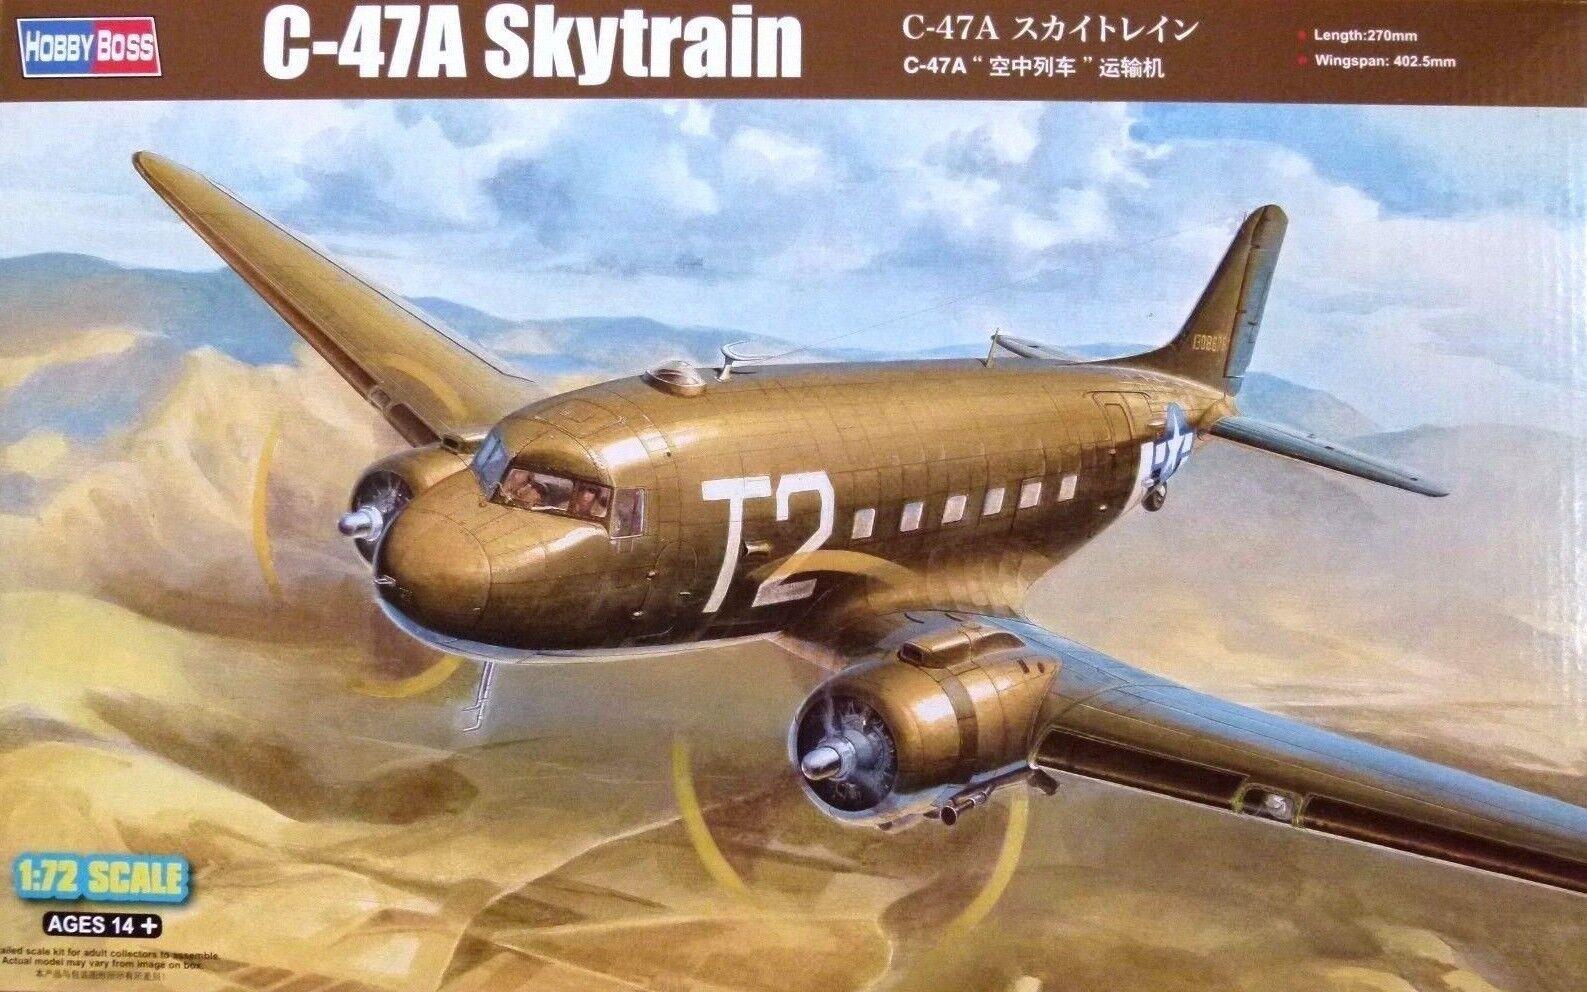 Hobbyboss 1 72 C-47A Skytrain Aircraft Model Kit